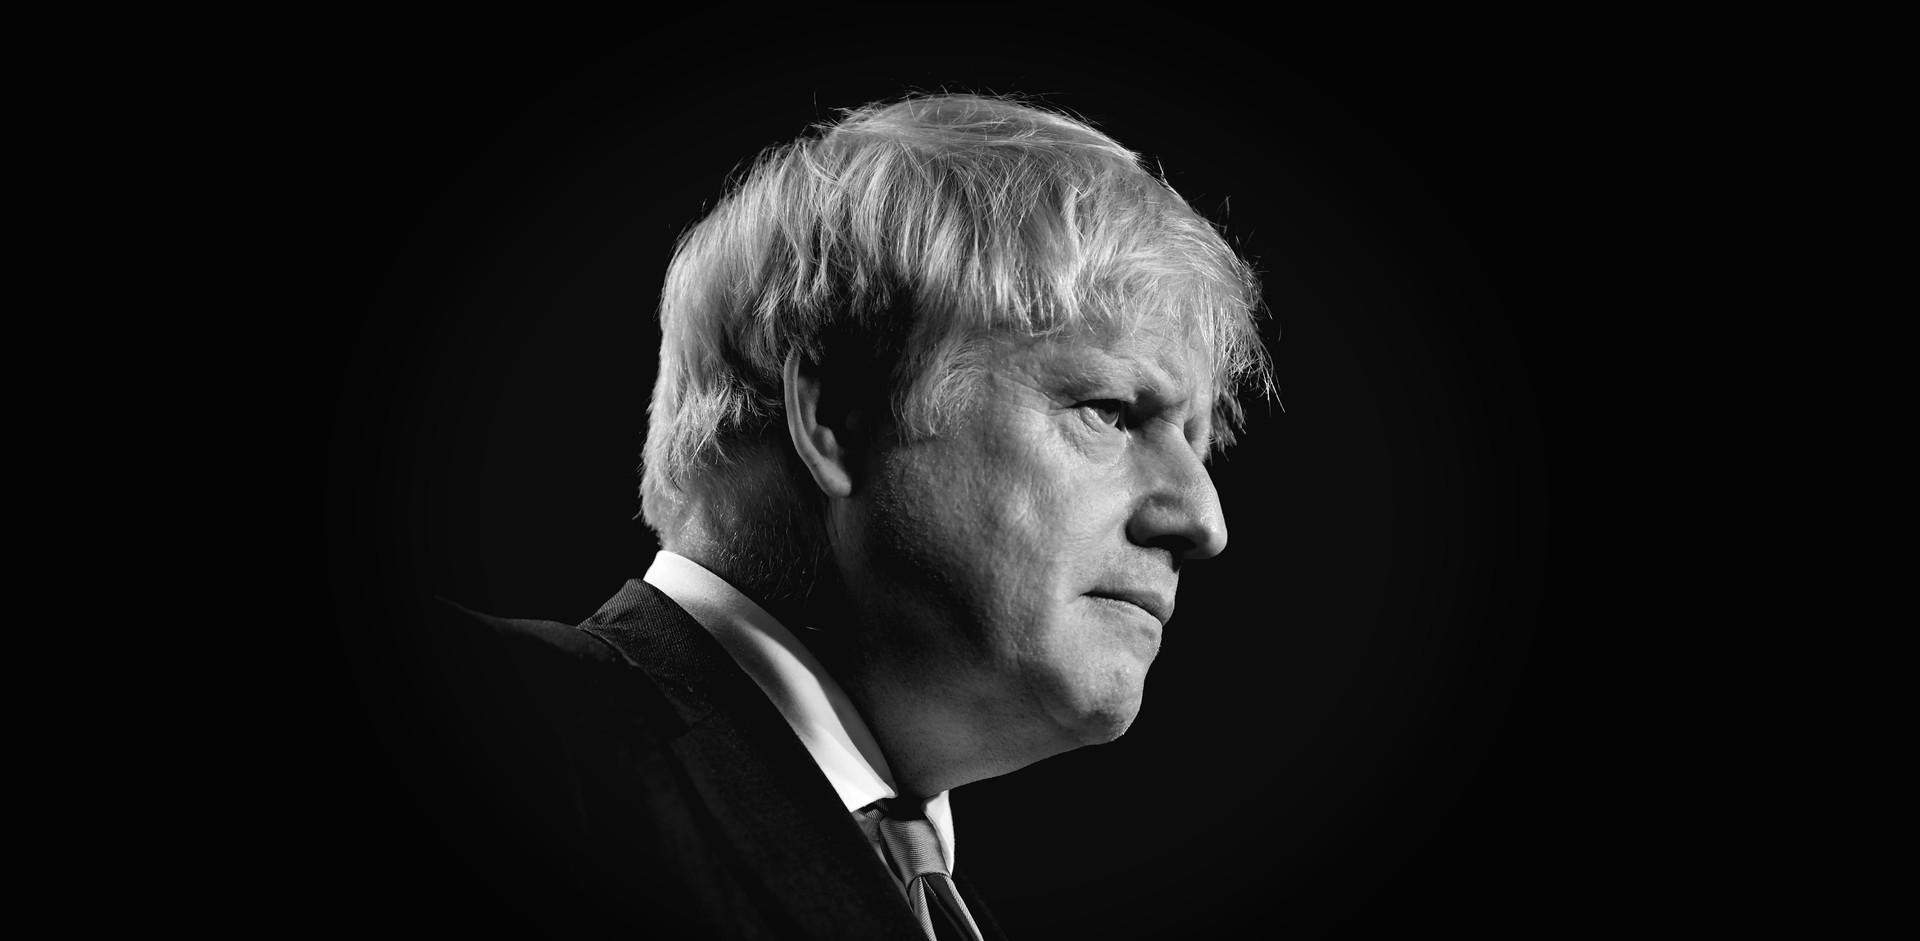 A portrait of Boris Johnson